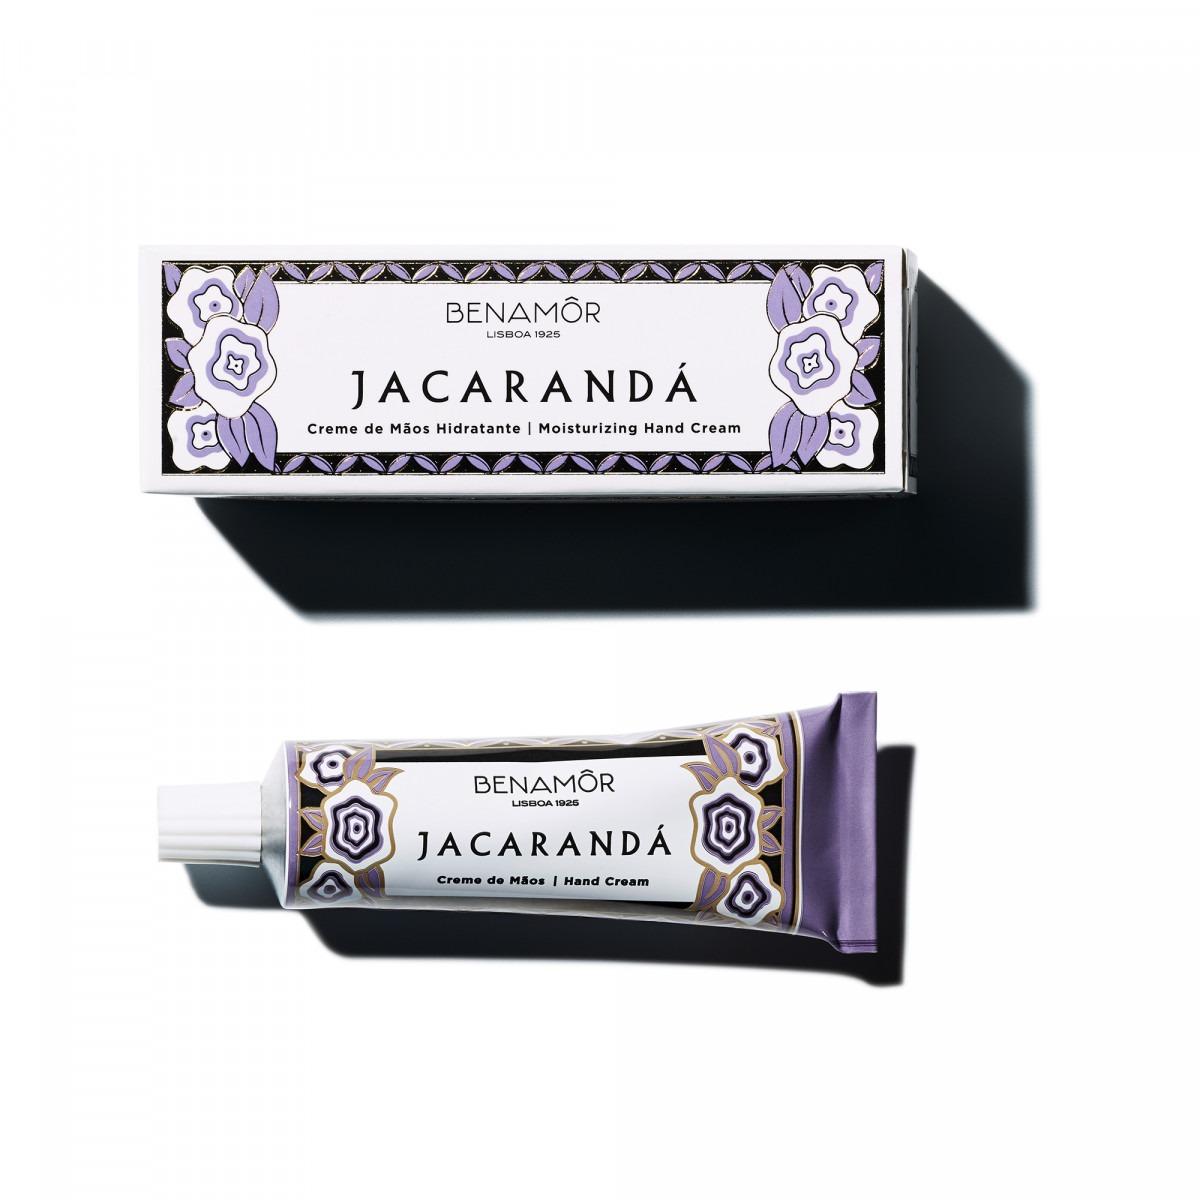 Benamor Jacaranda Protective Hand Cream 30ml